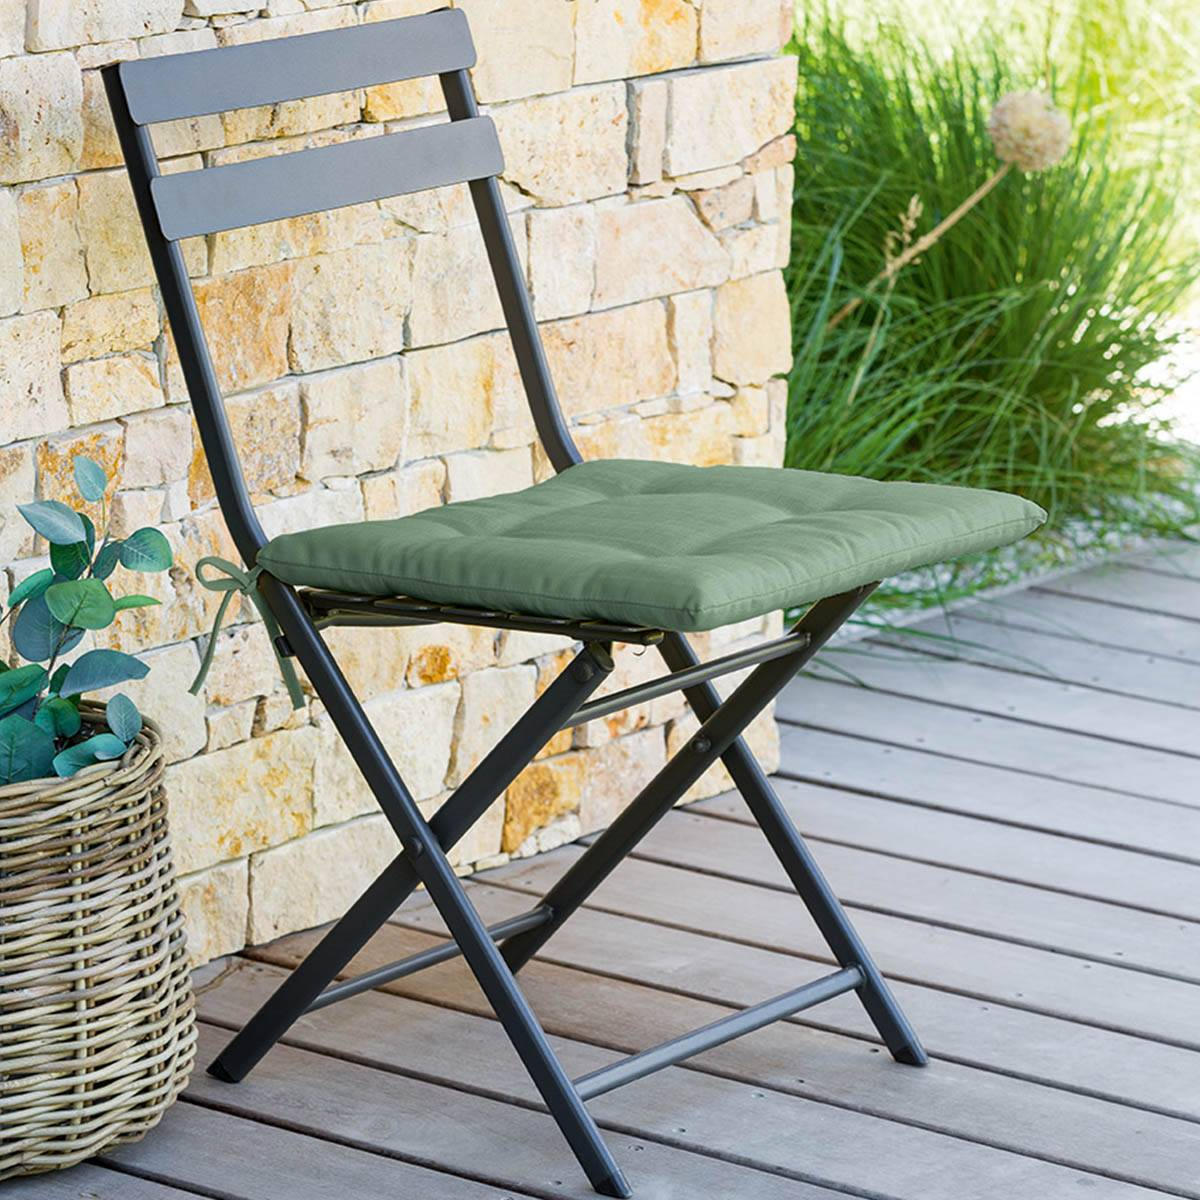 Hespéride Galette de chaise 4 points Korai Vert olive Jardin